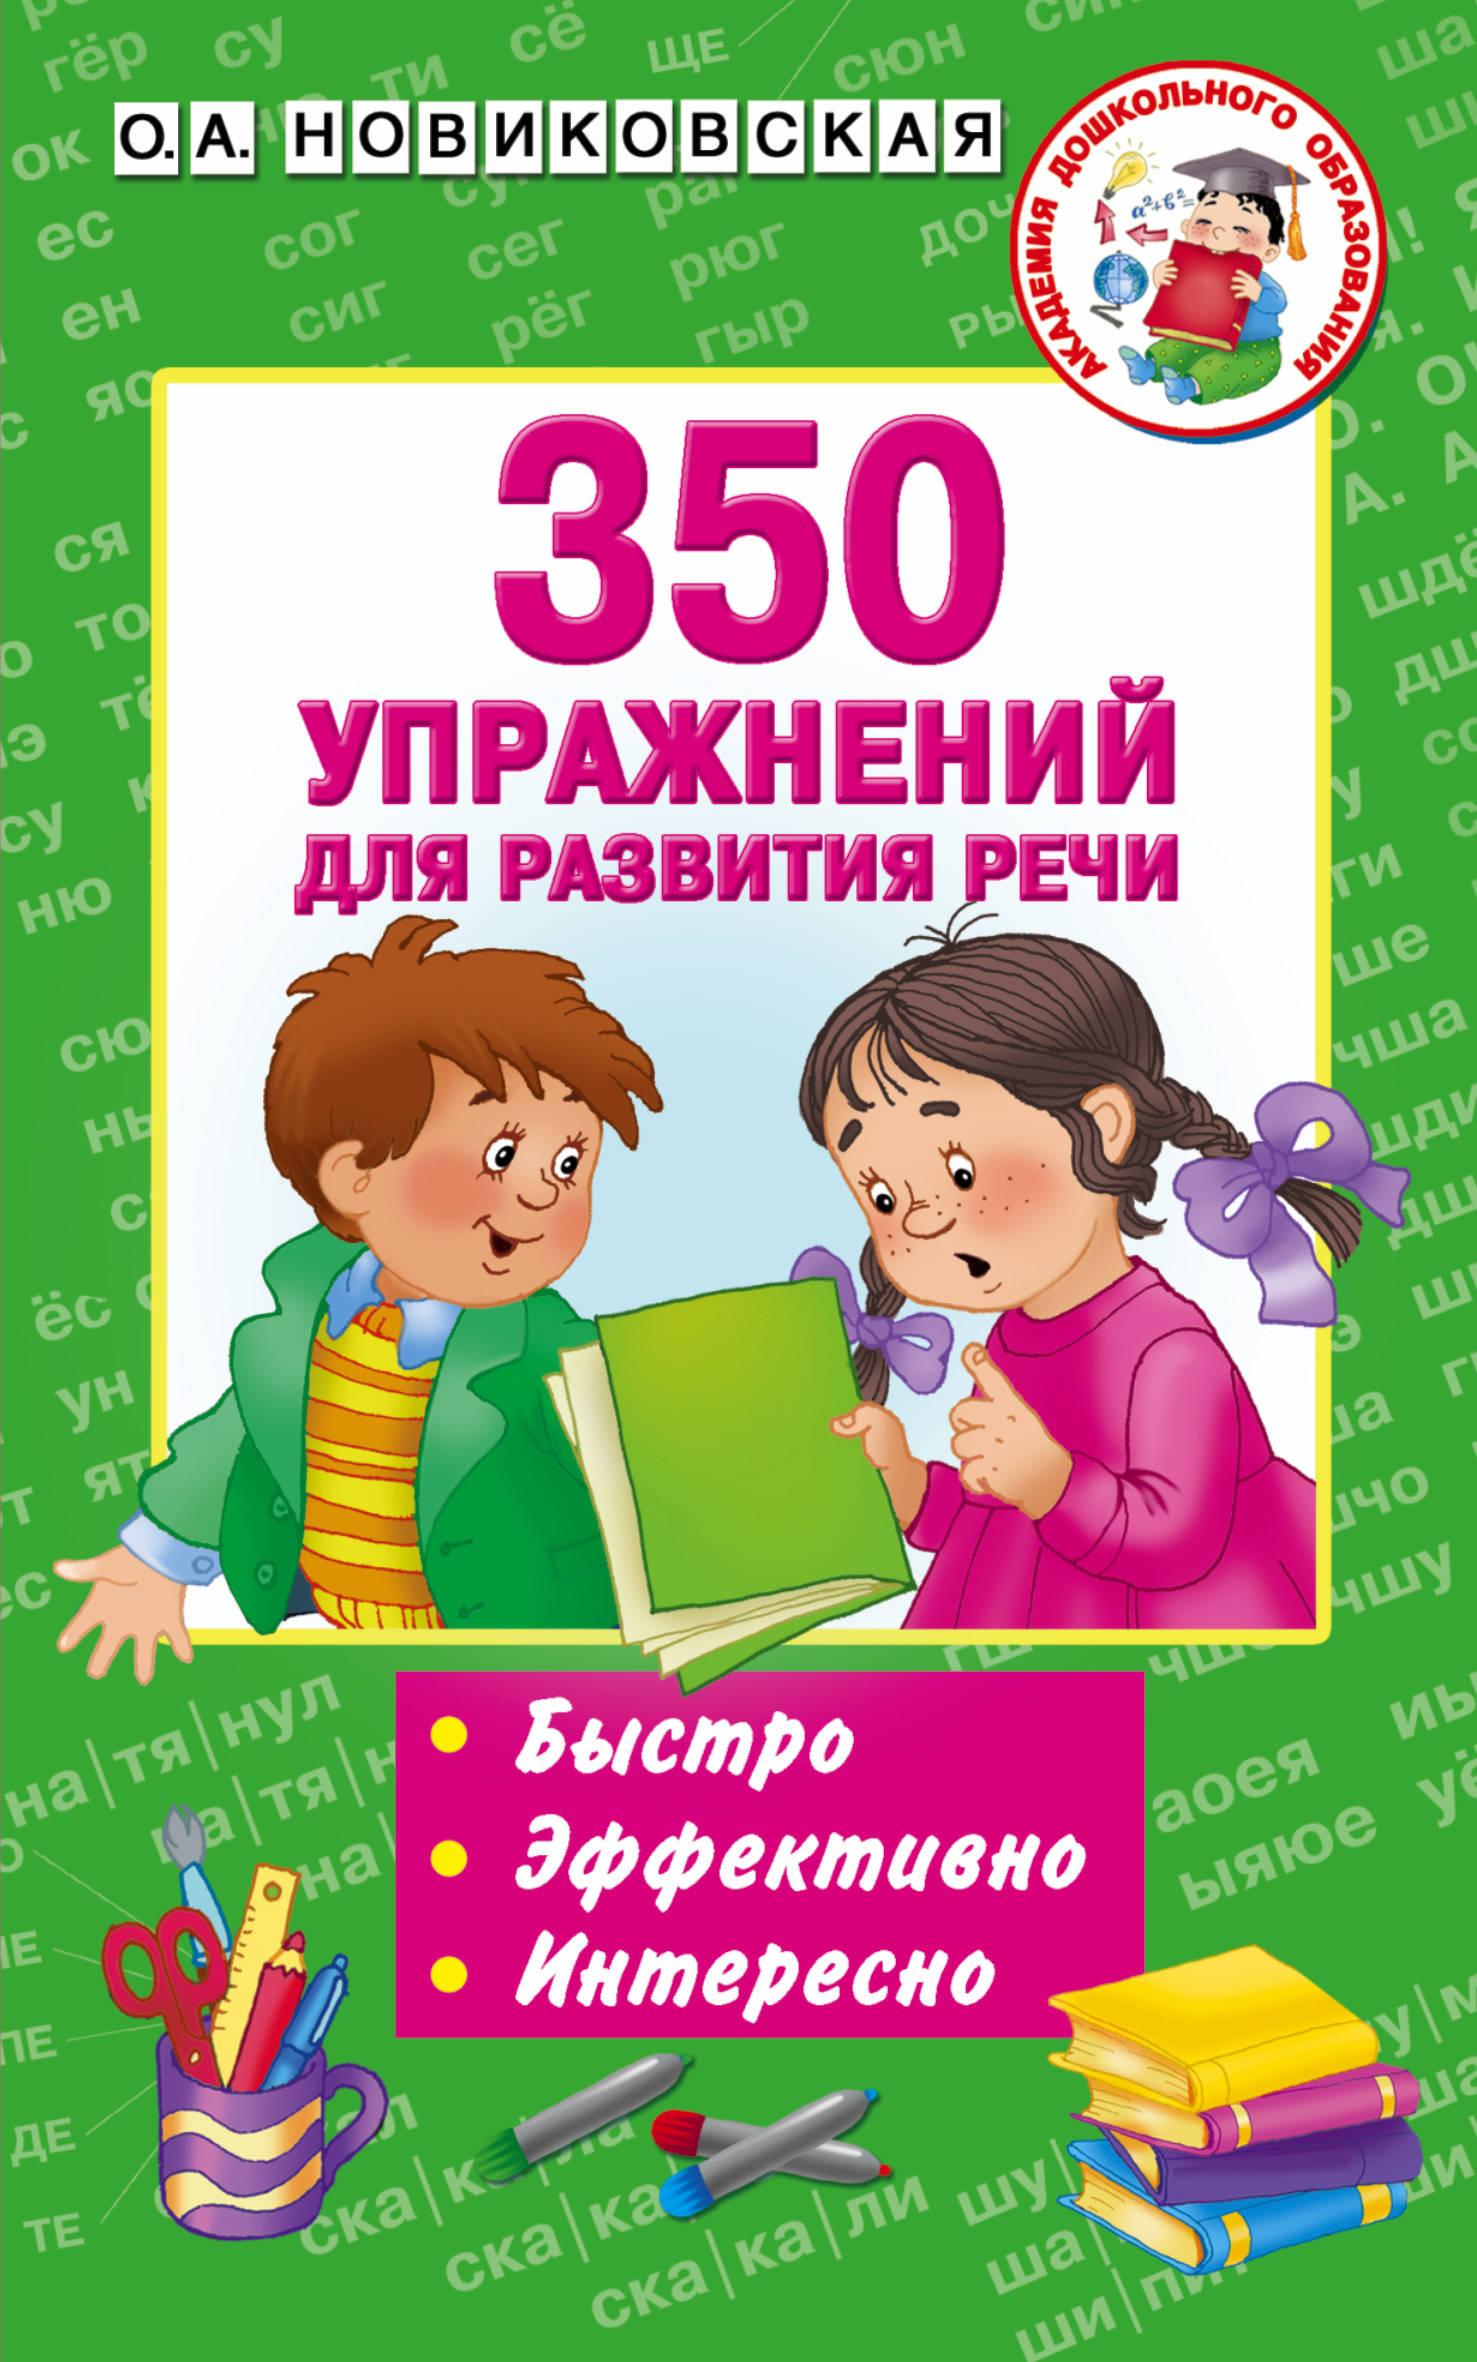 цена на Новиковская О.А. 350 упражнений для развития речи